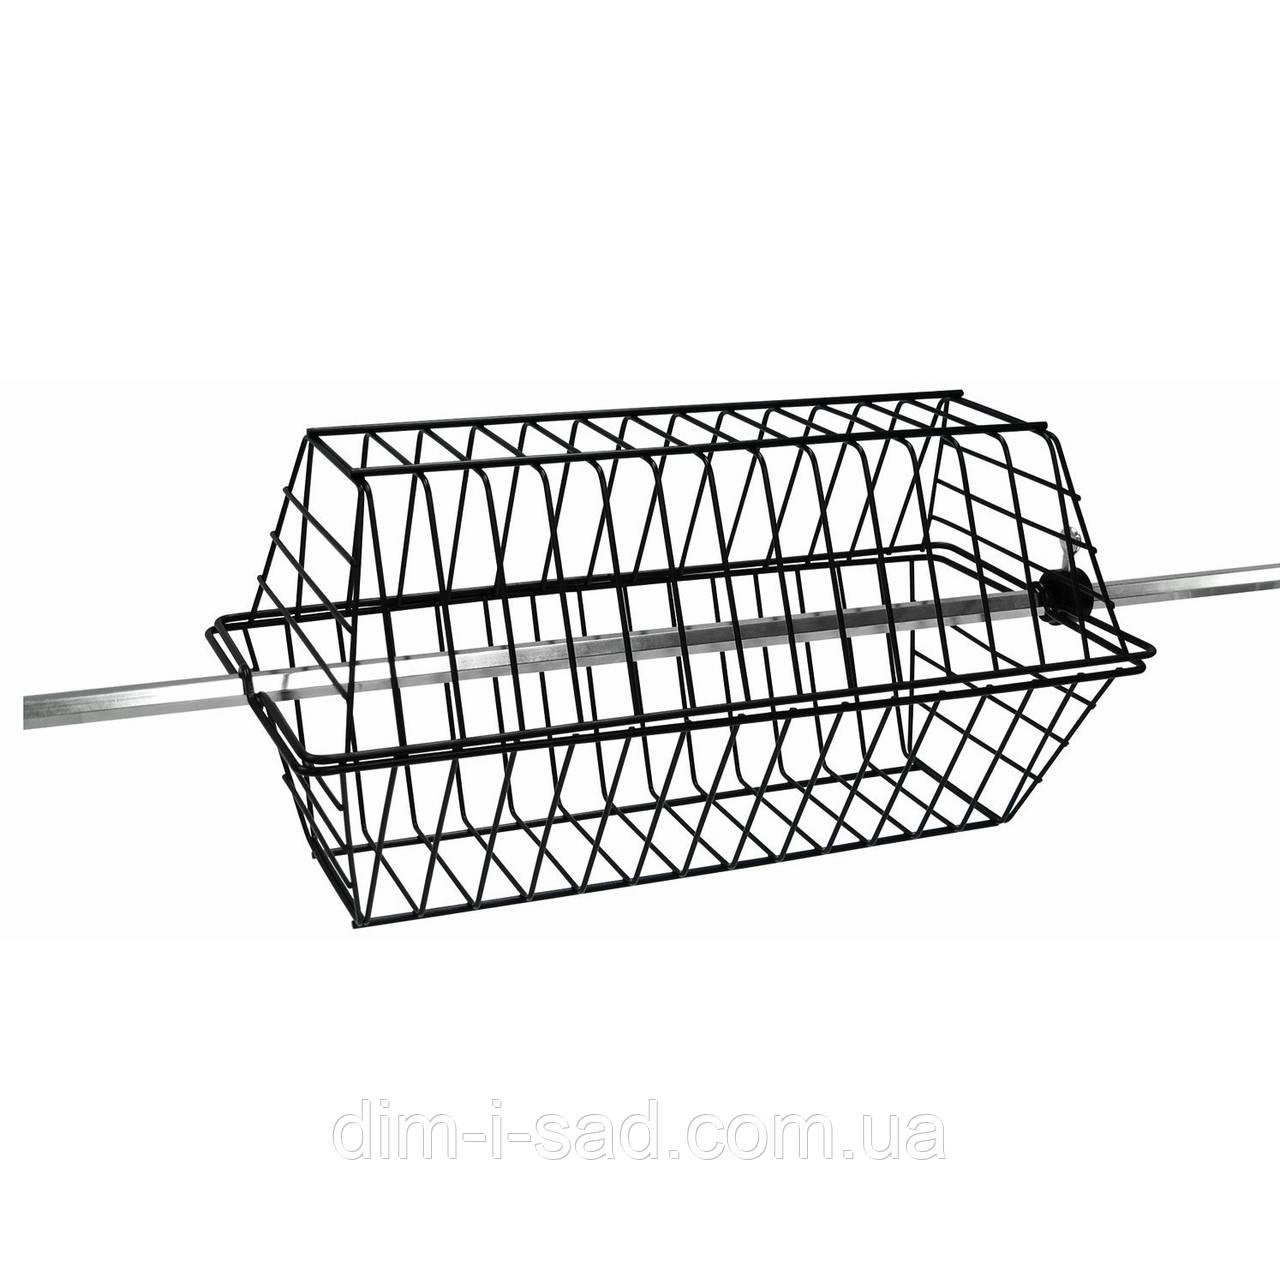 Антипригарная сетка для курицы и рёбер на вертел Broil King